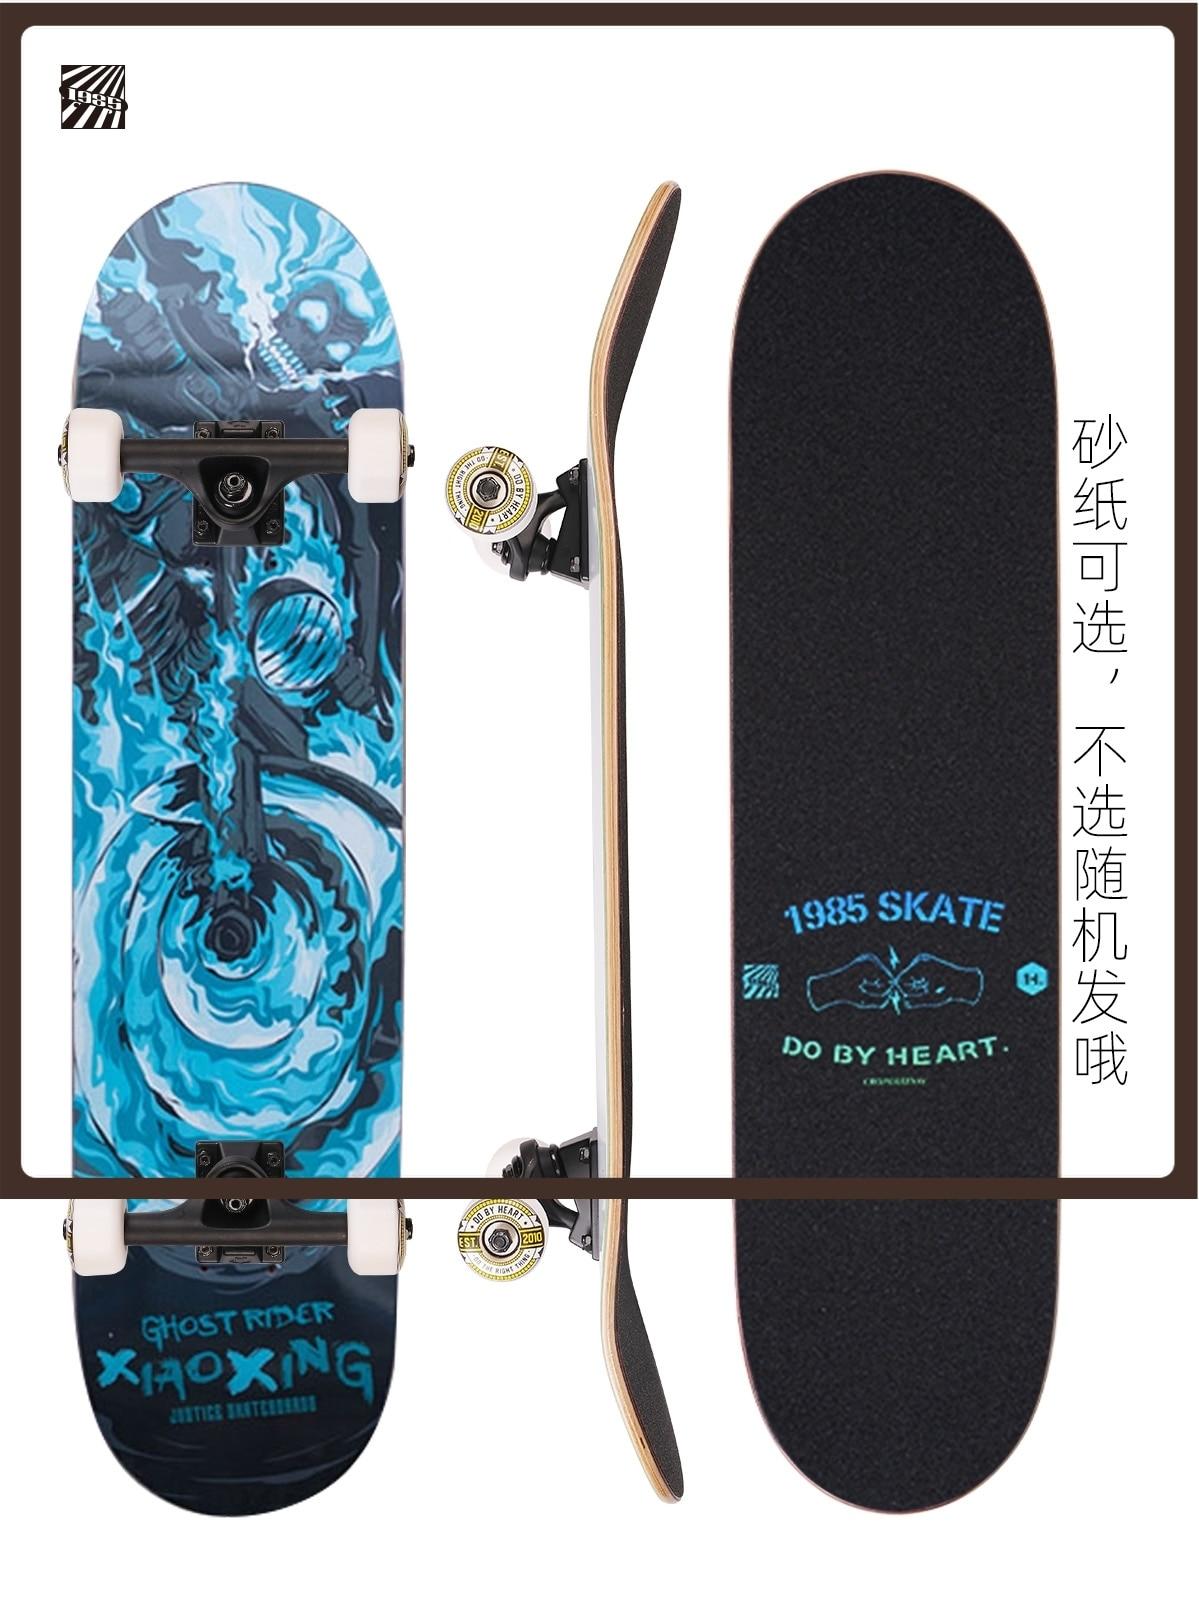 4 Wheel Long Board Skateboard Deck Teenagers Complete Skateboard Action Drift Skate Cruiser Kids Deskorolka Sports Equipment